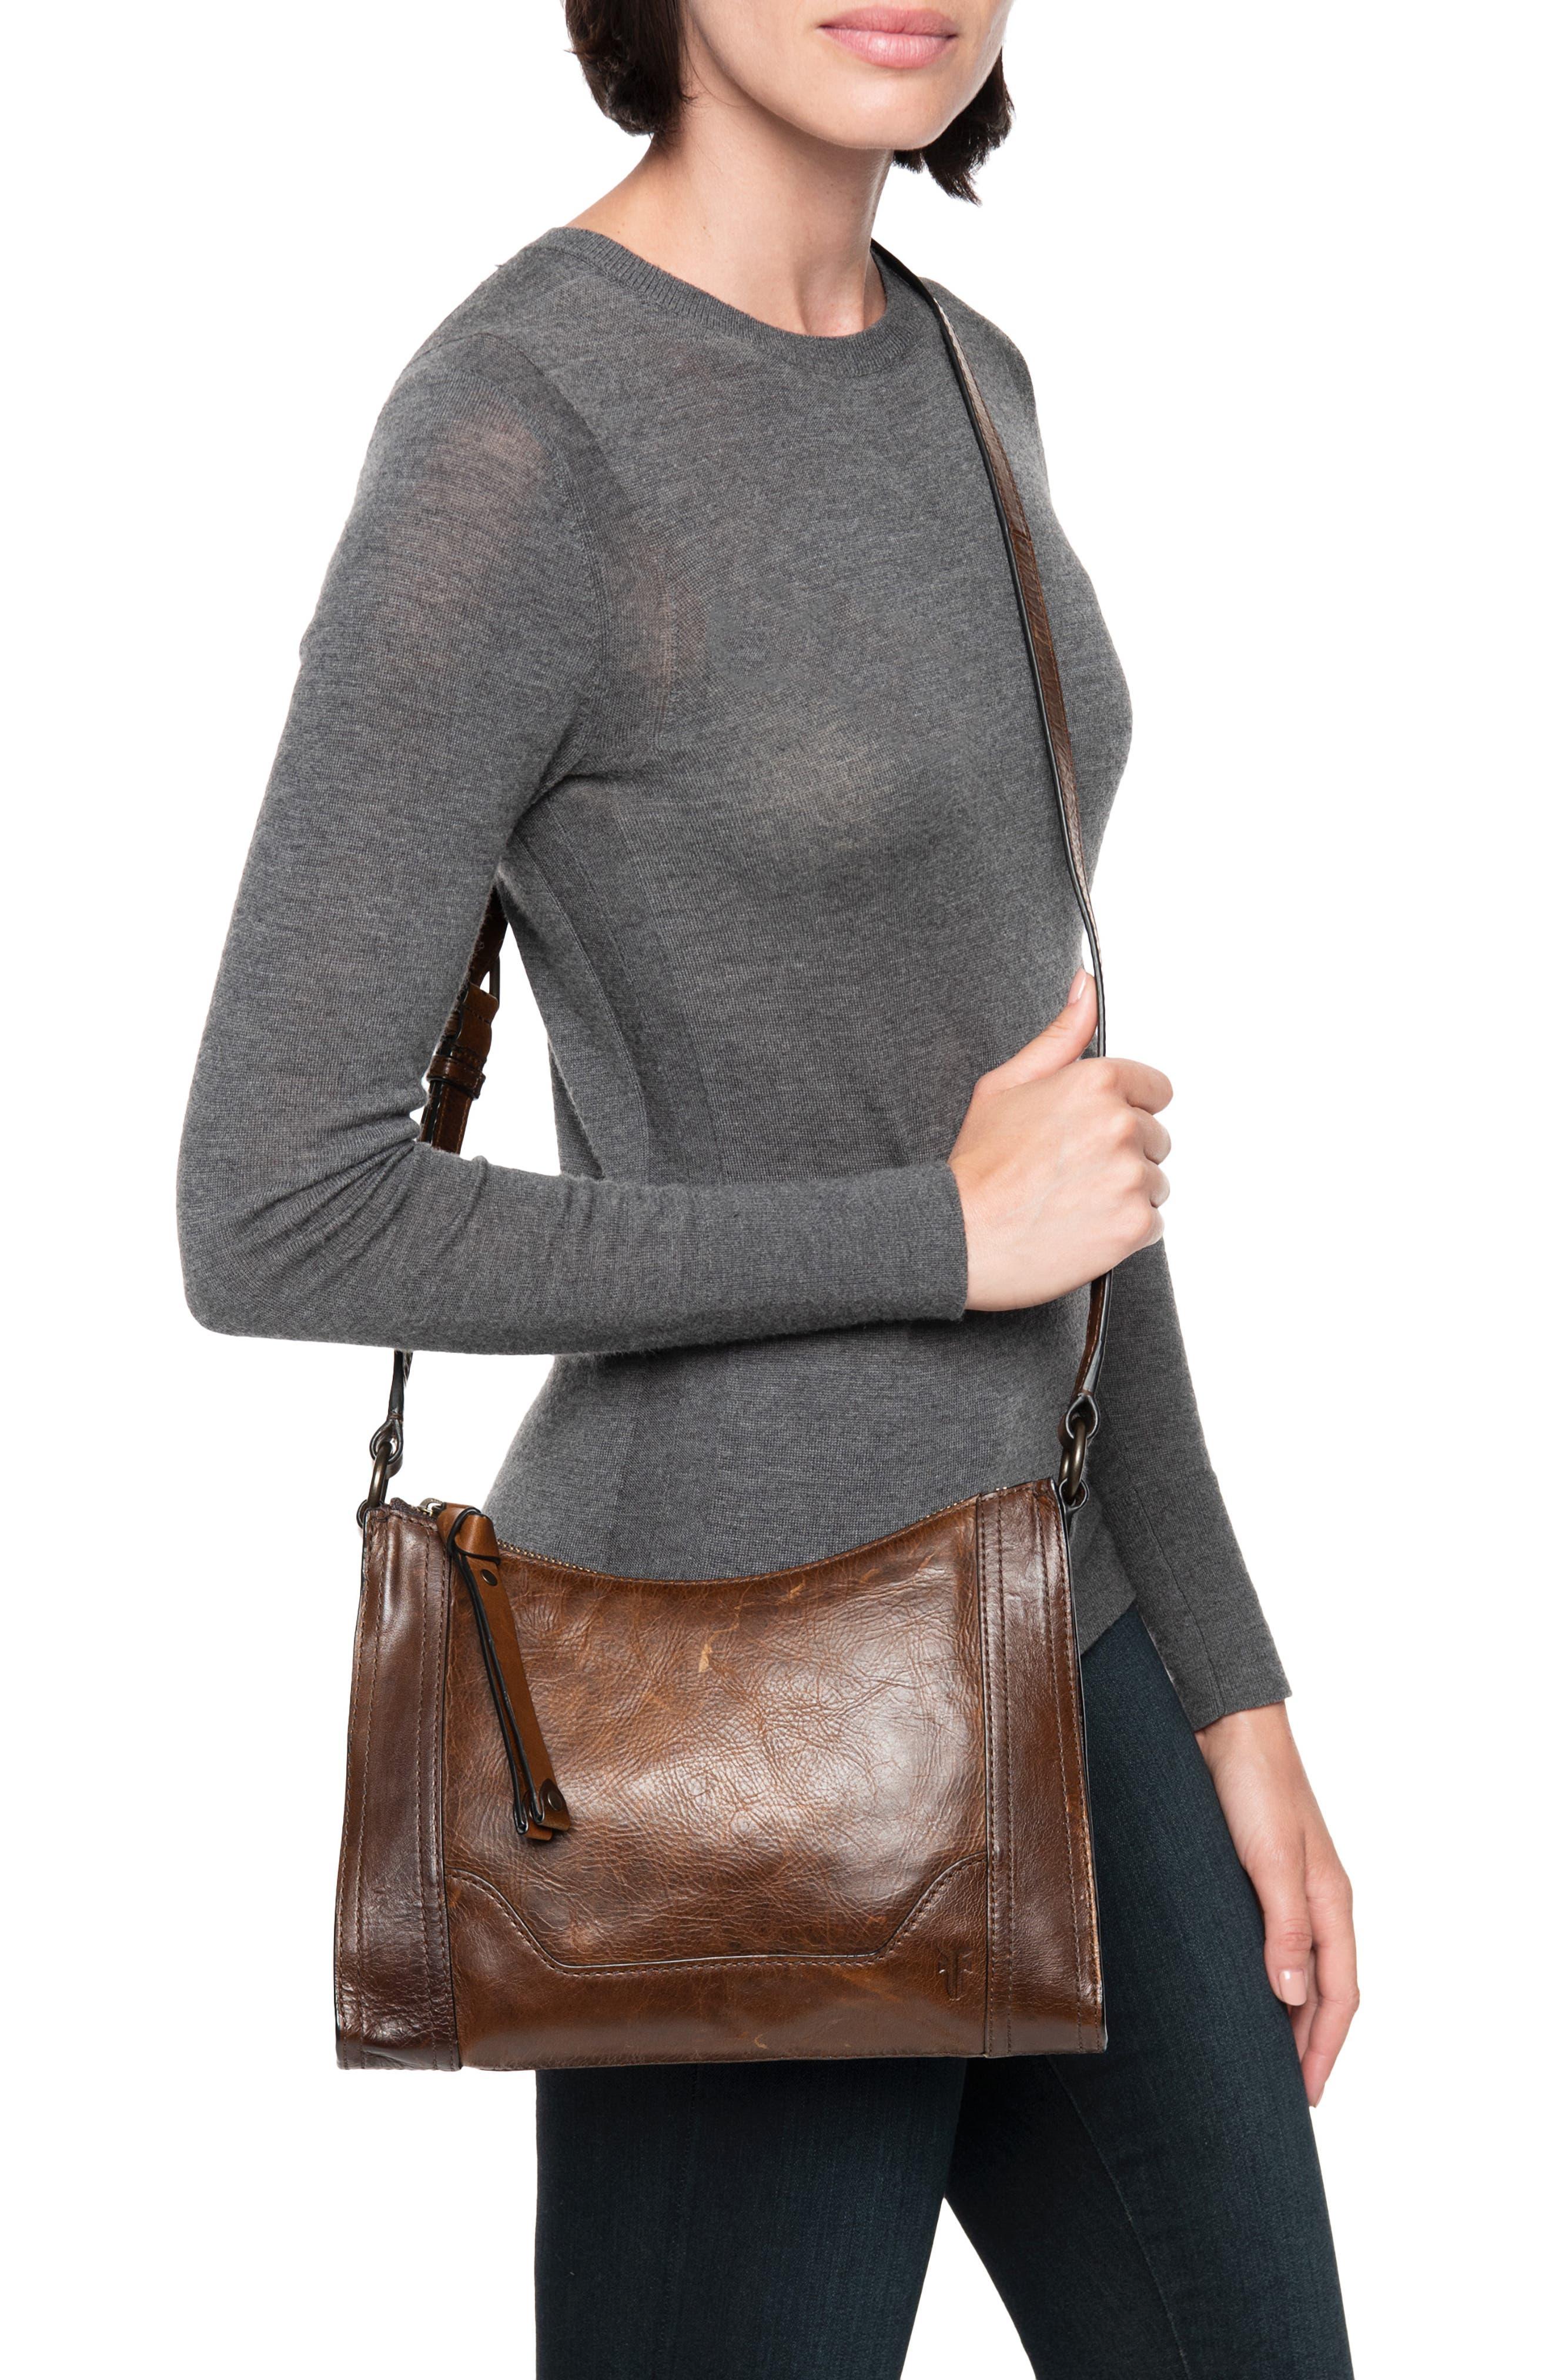 Melissa Leather Crossbody Bag,                             Alternate thumbnail 2, color,                             DARK BROWN